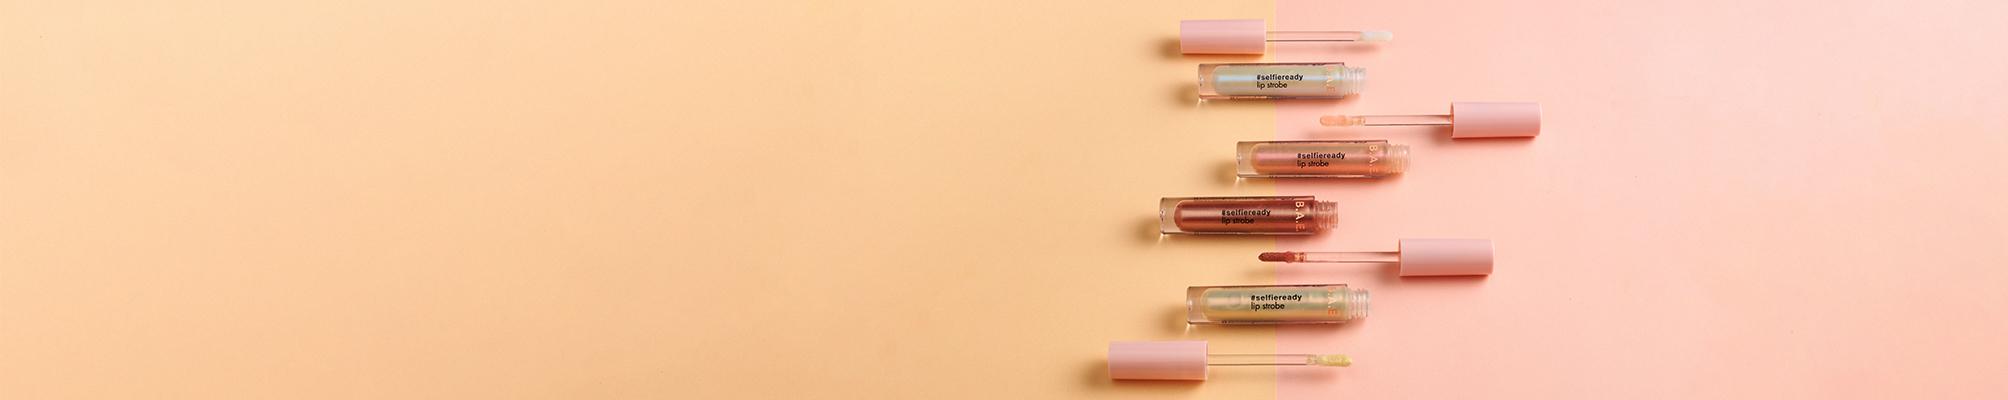 lippenstift en lipgloss - Herobanner - HEMA